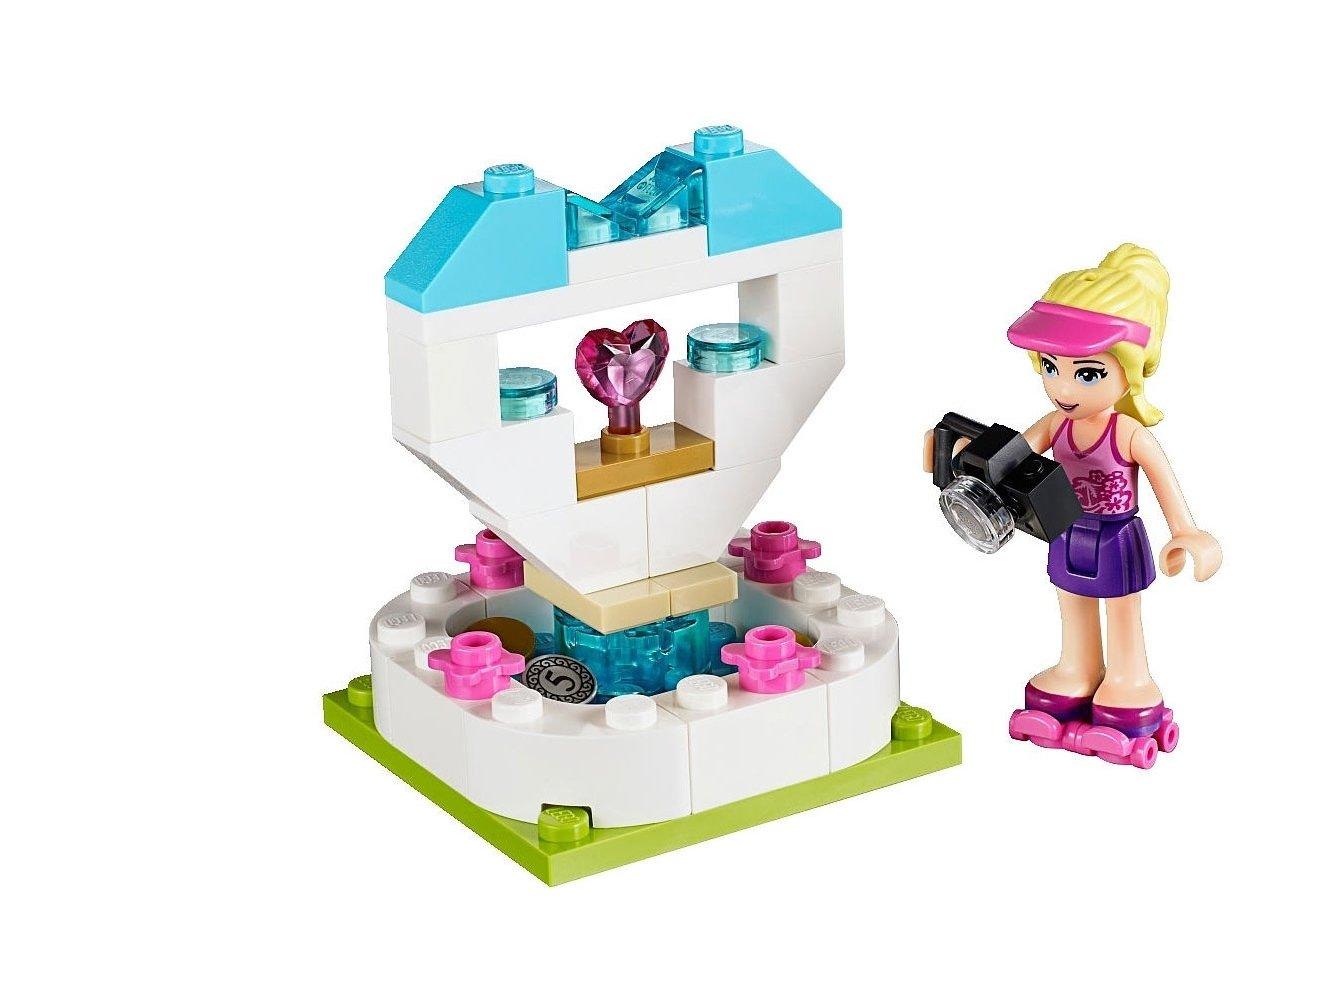 LEGO 30204 Wish Fountain